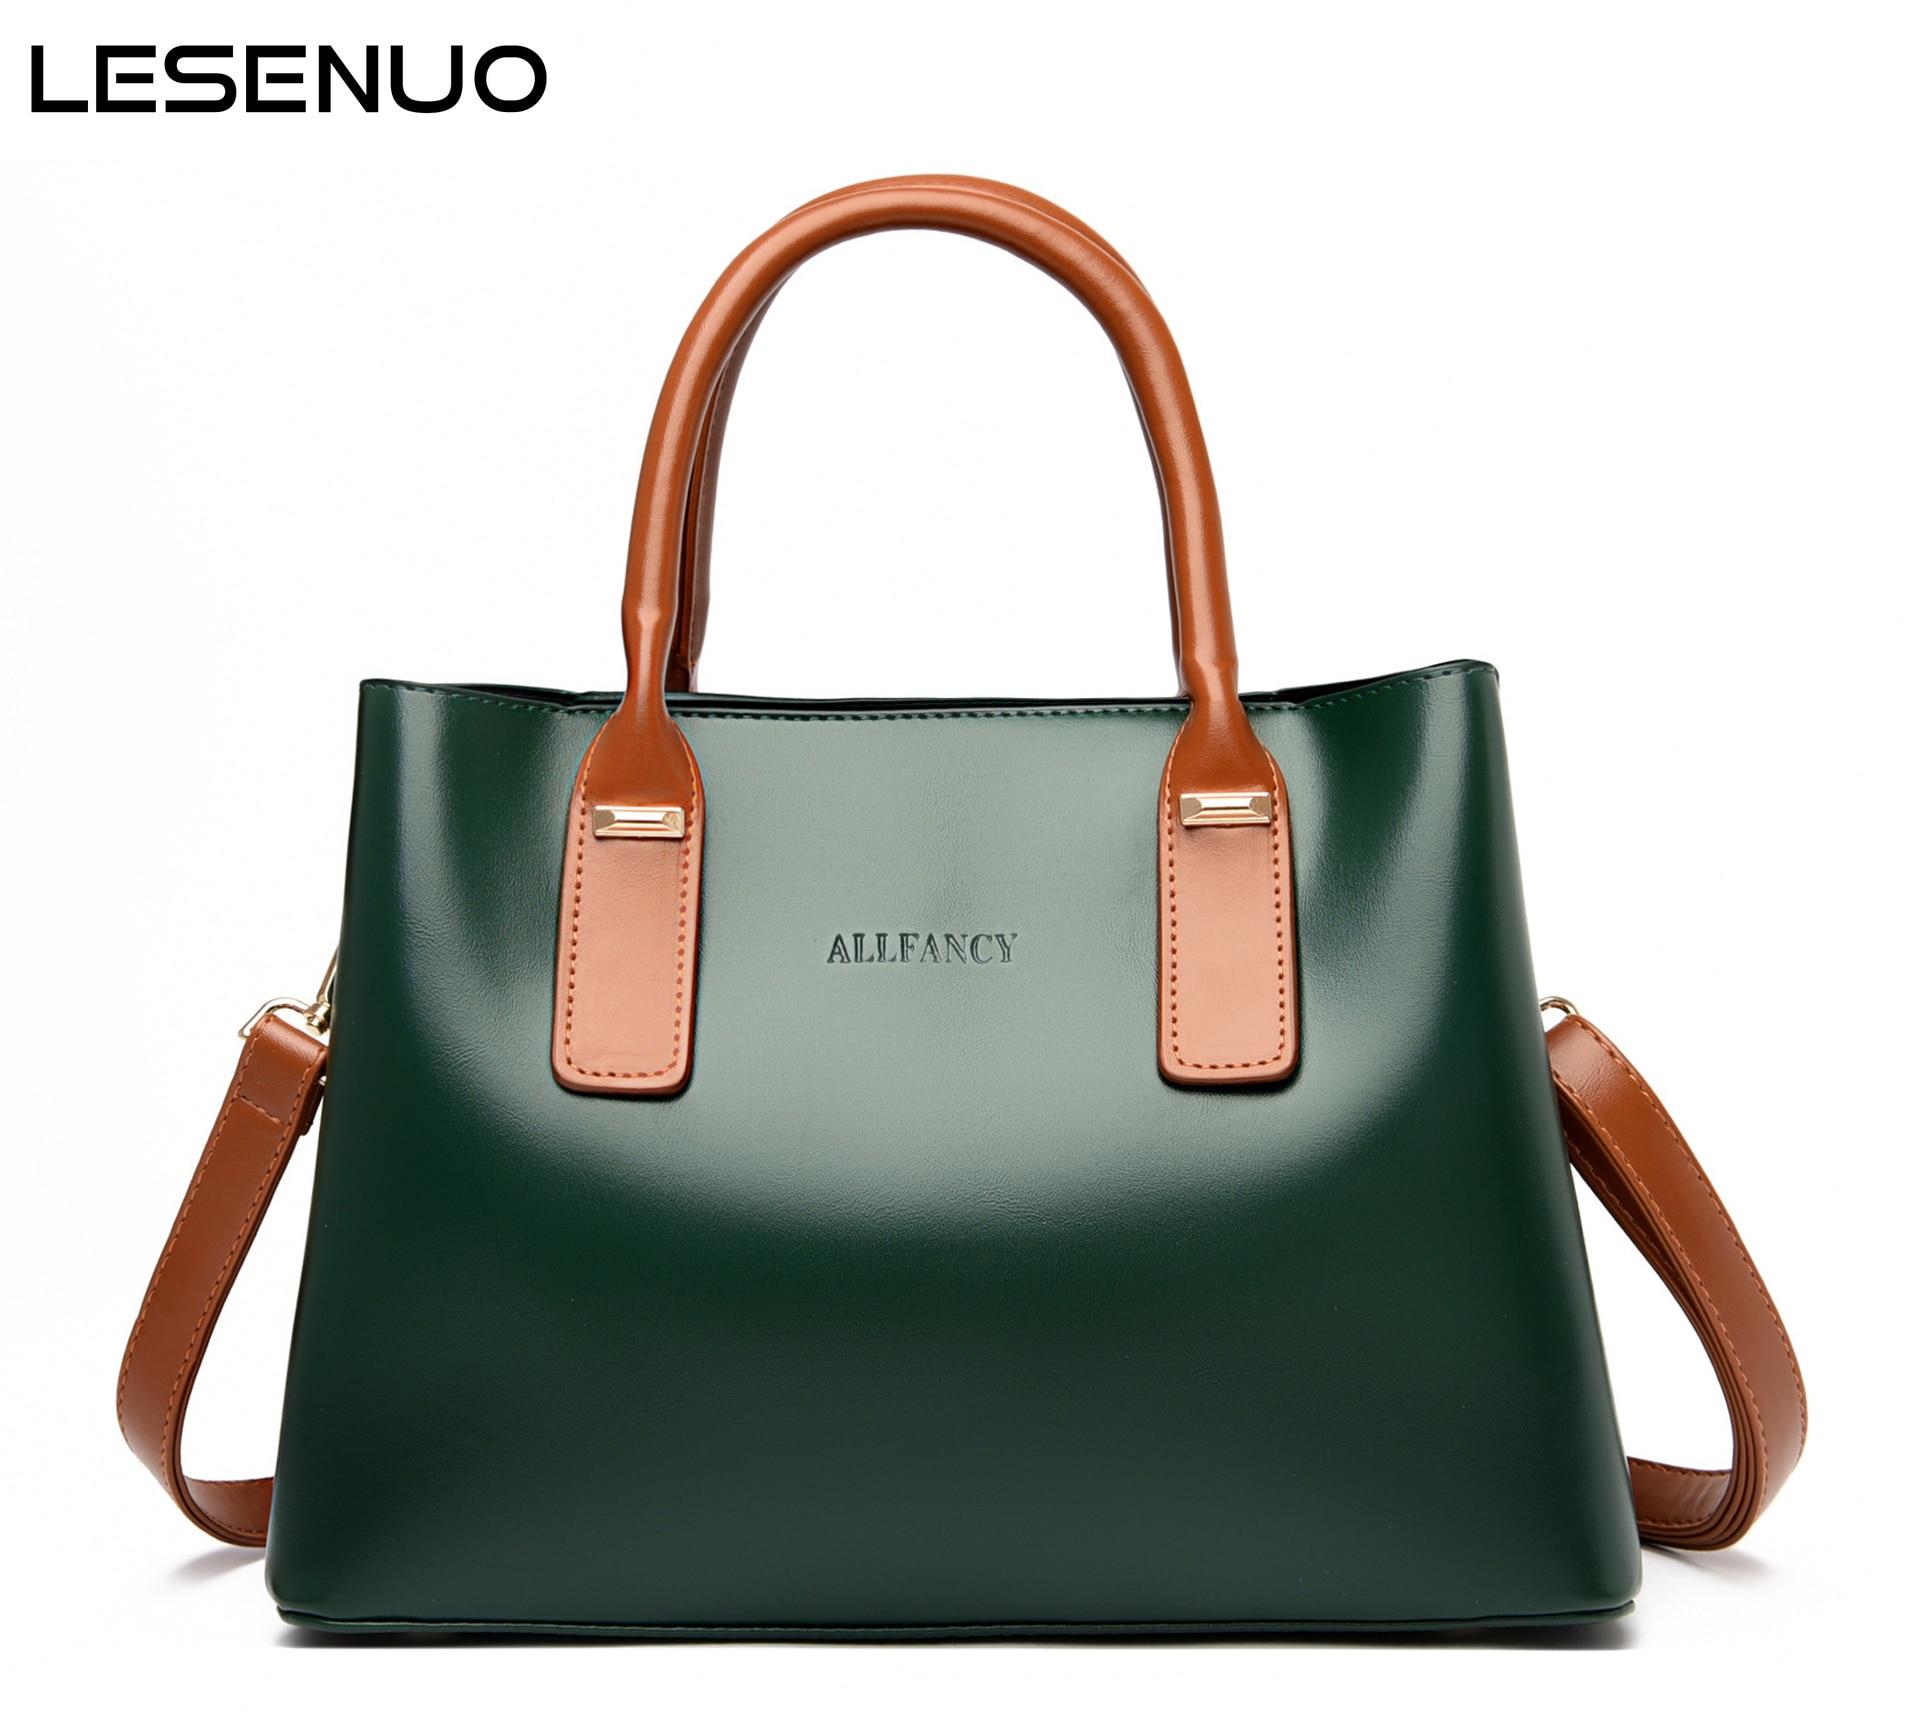 LESENUO Women Vintage Handbags Designer Large Capacity Tote Bag 2020 Ladies Fashion Luxury Handbags Brand Handbags Shoulder Bag